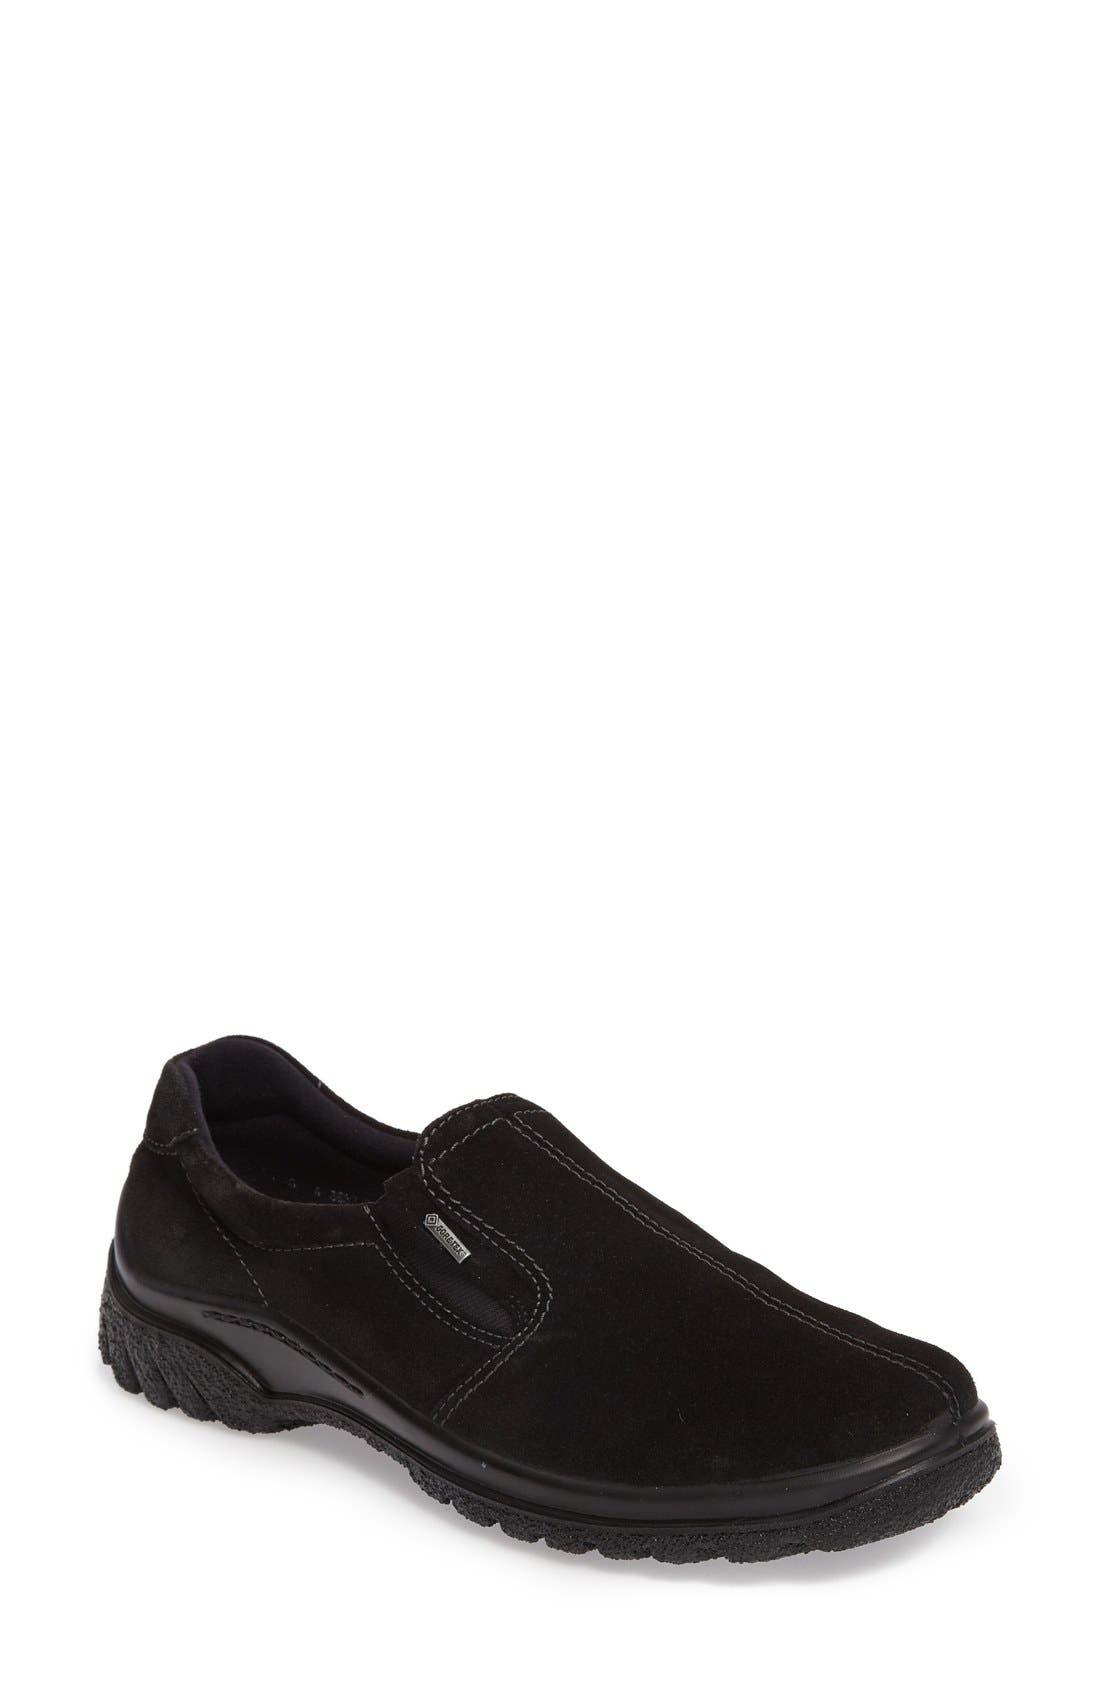 Main Image - ara Parson Waterproof Gore-Tex® Slip-On Sneaker (Women)